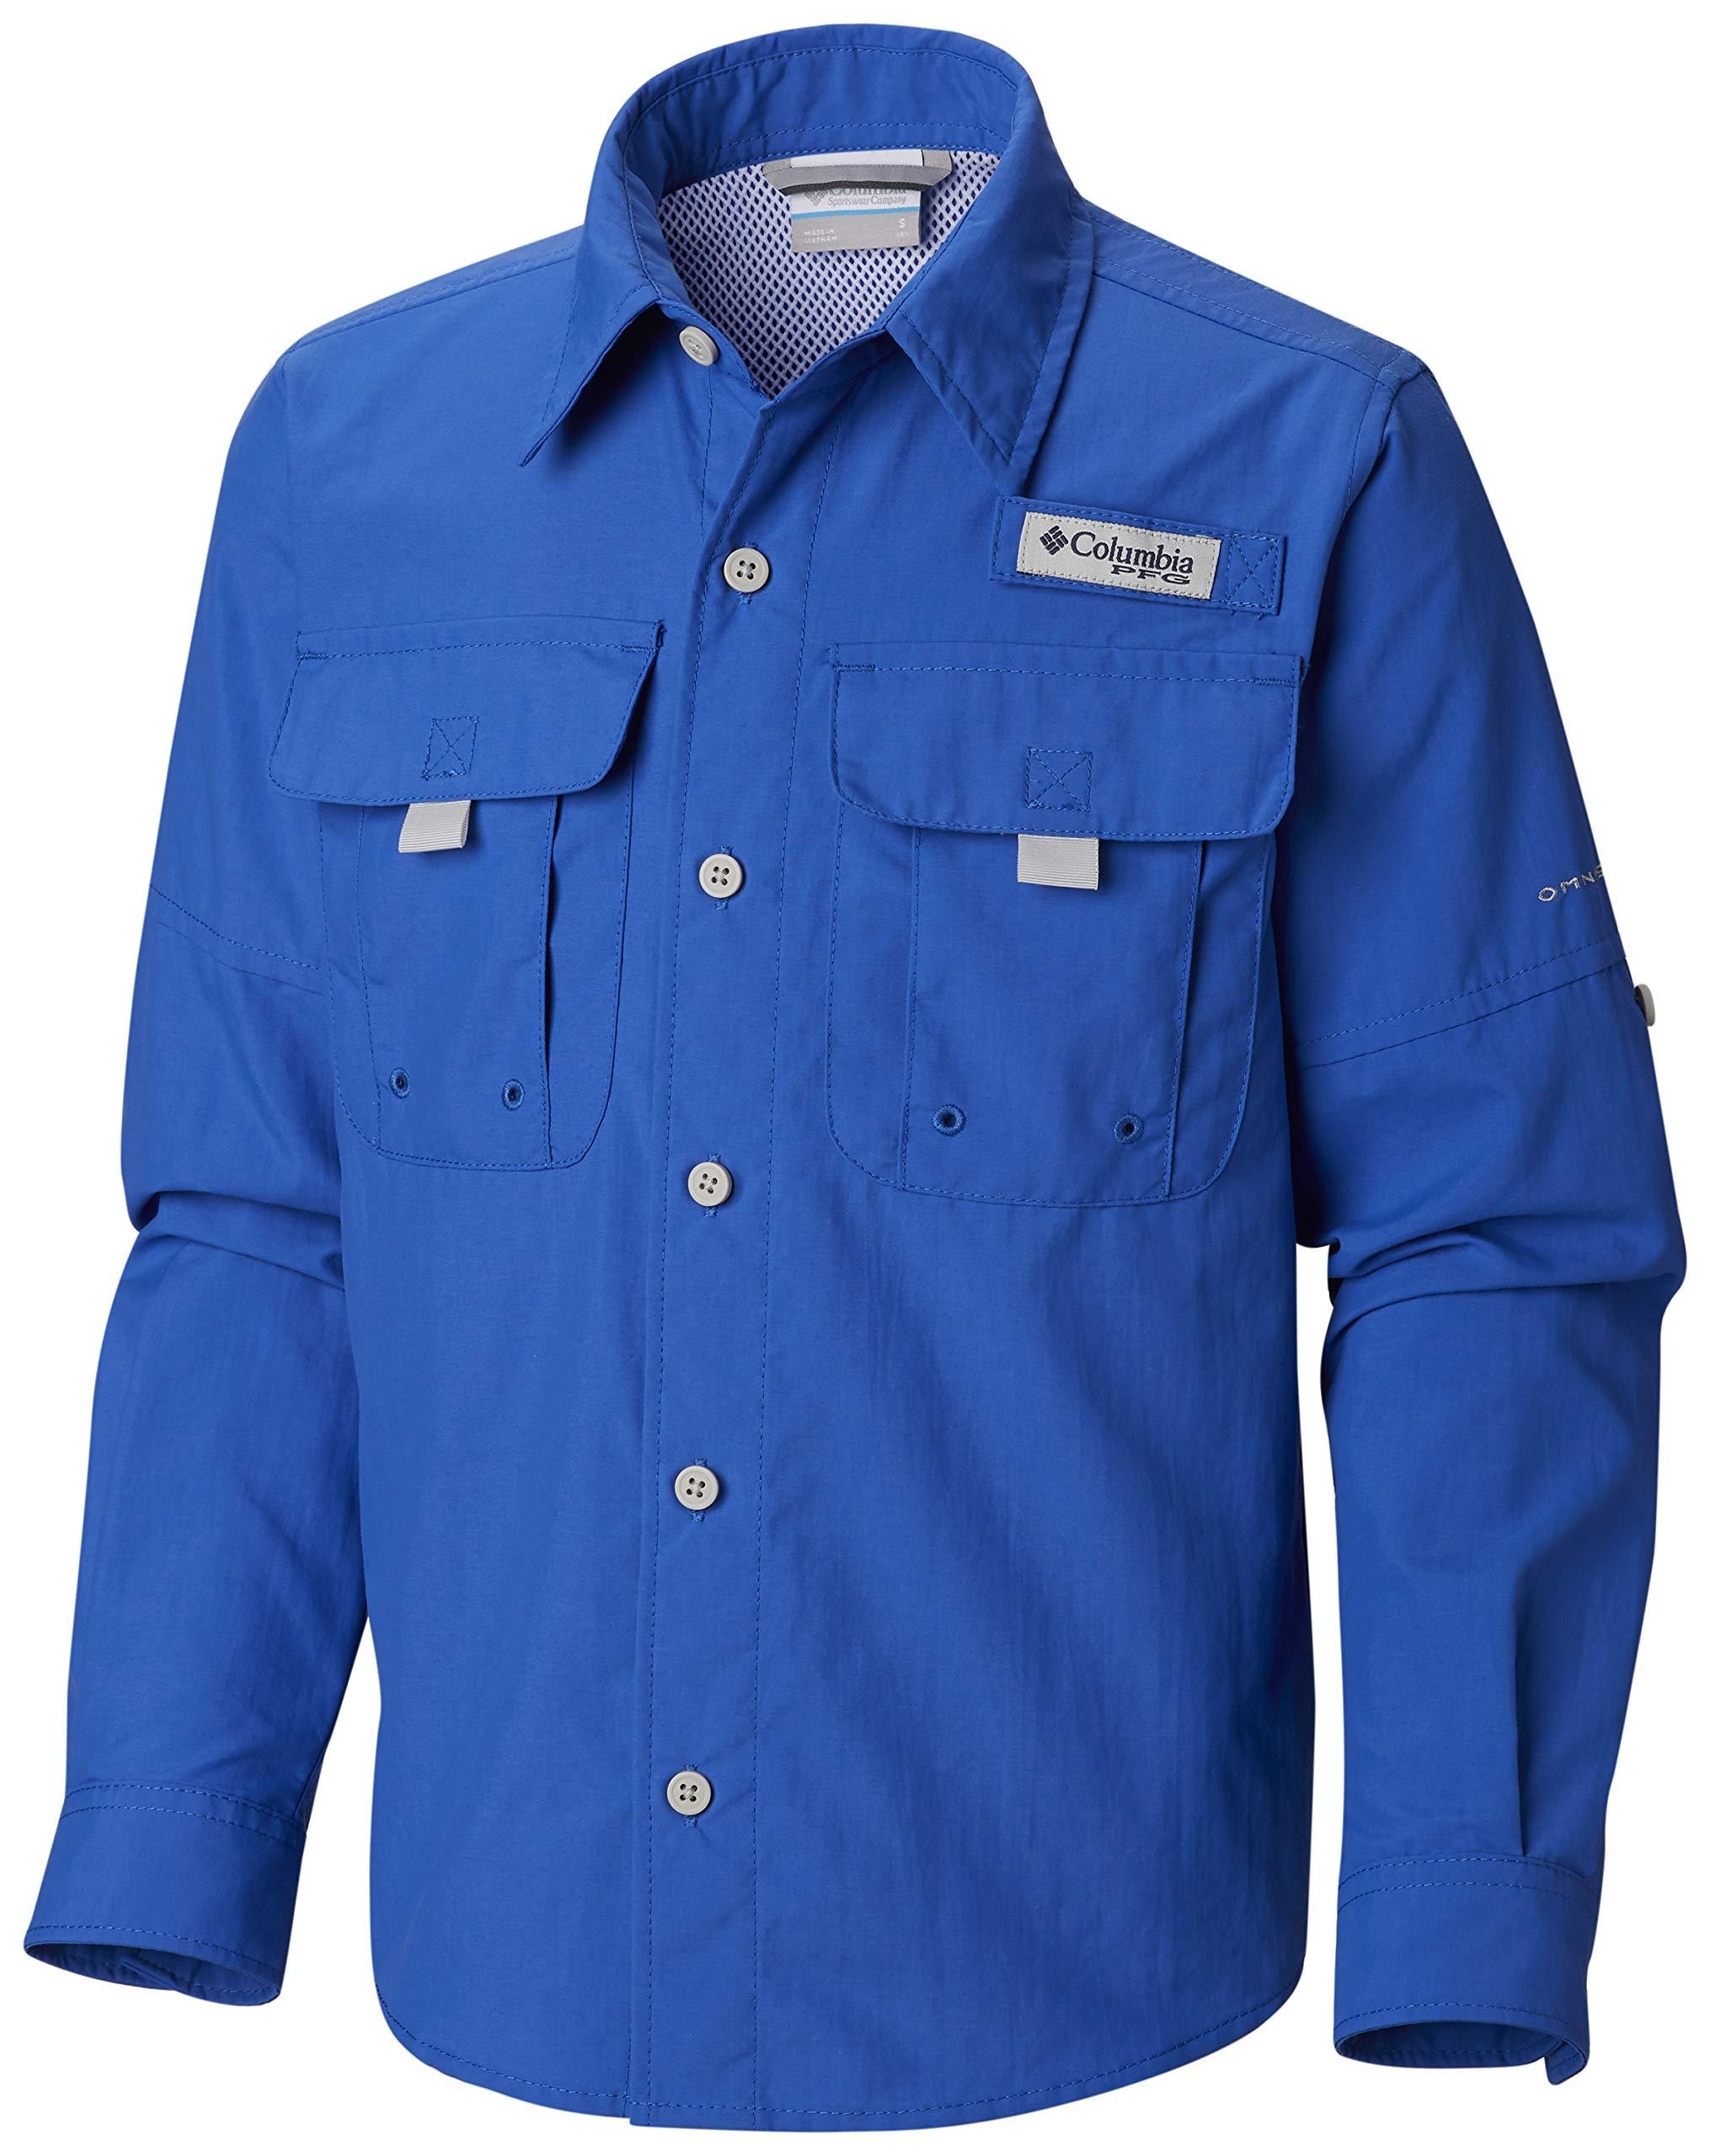 Columbia Boy's Bahama Long Sleeve Shirt, Vivid Blue, Small